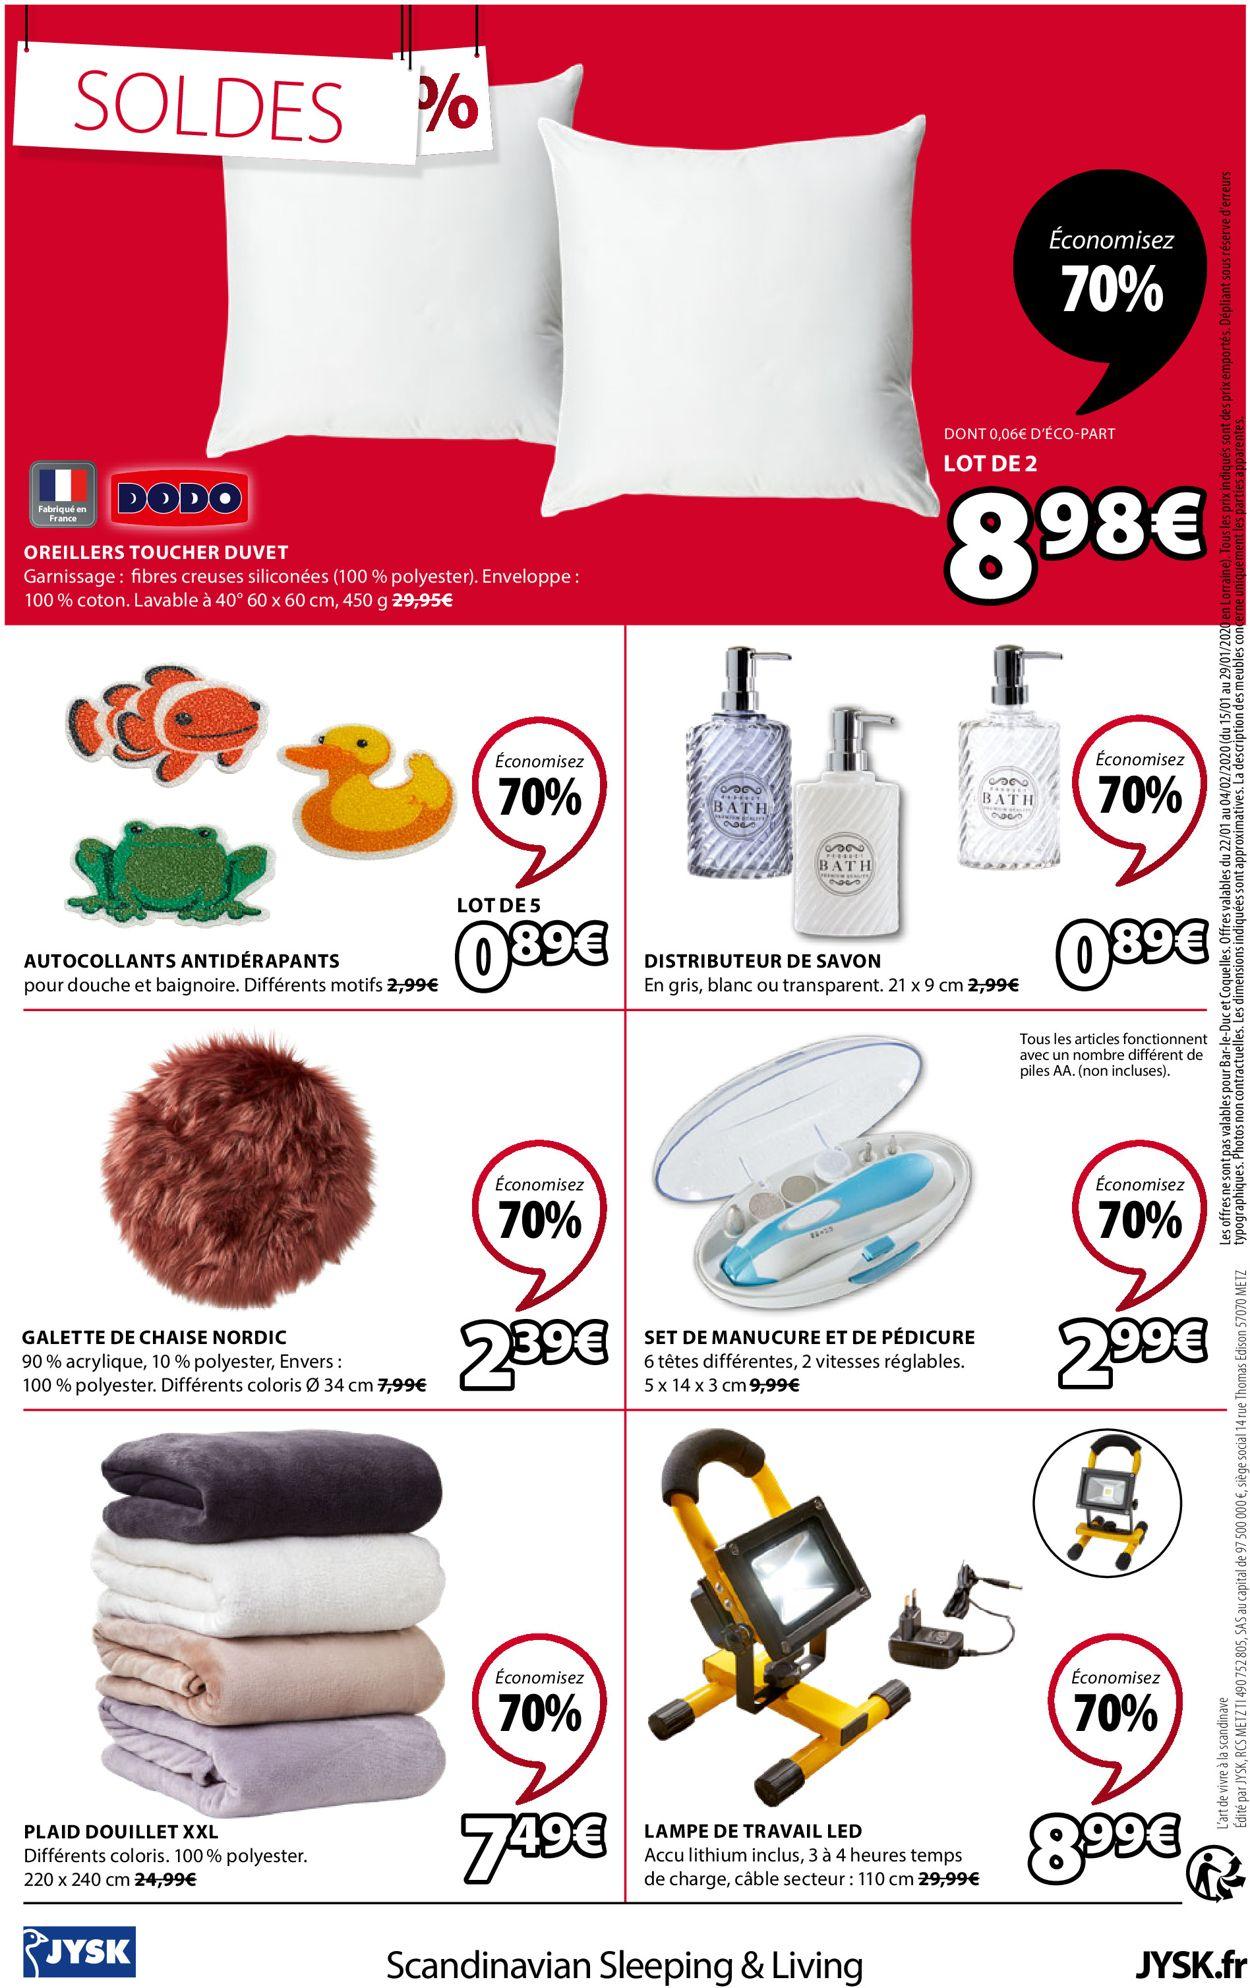 JYSK Catalogue - 22.01-04.02.2020 (Page 16)